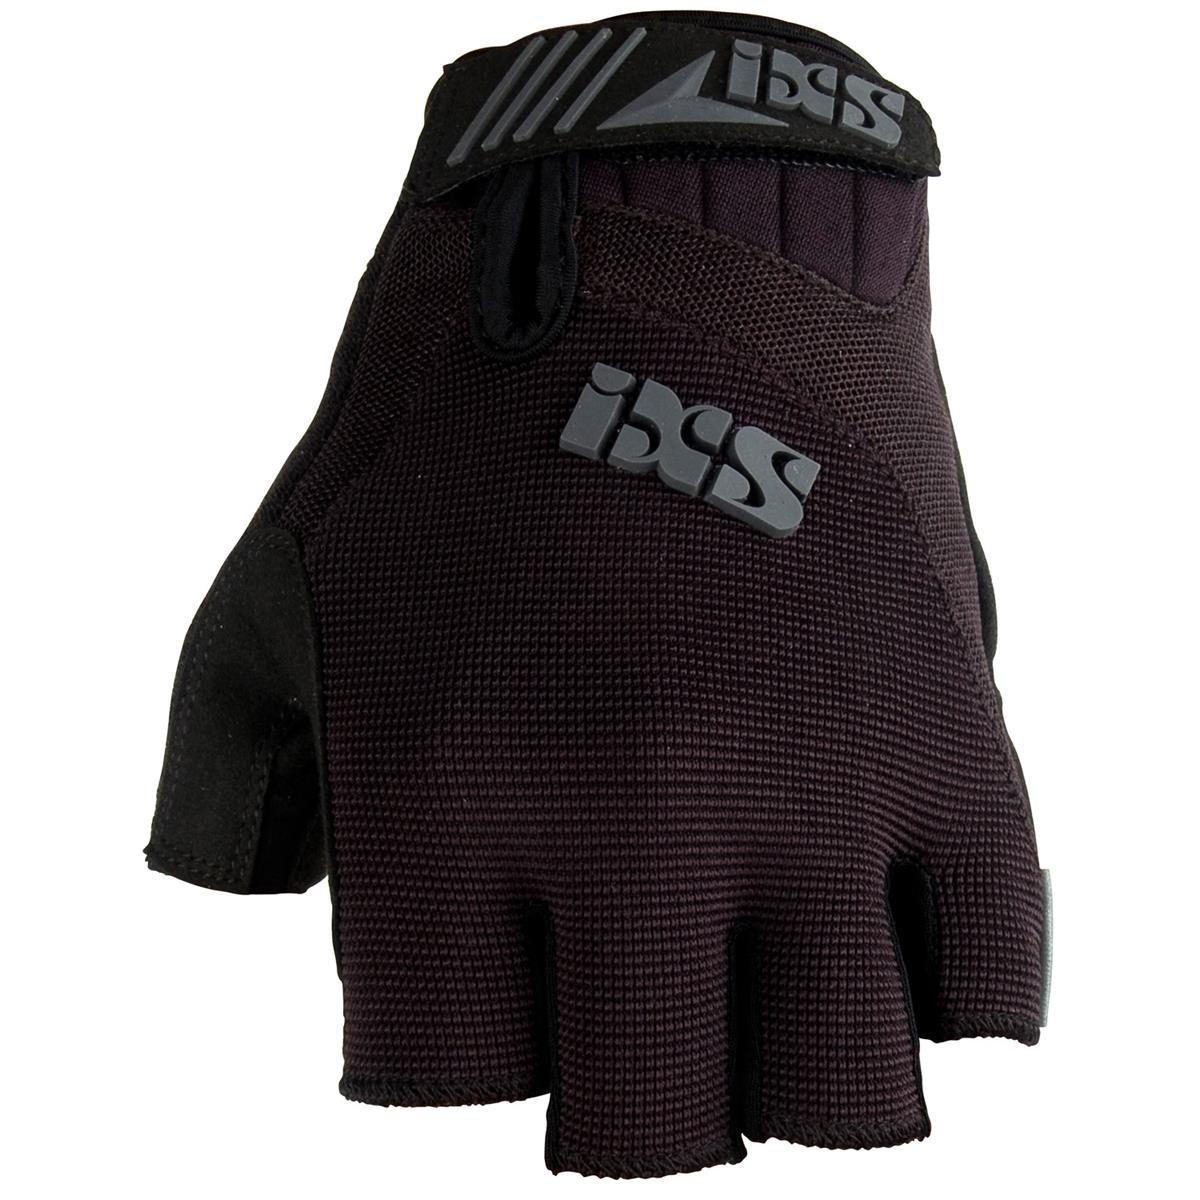 IXS Kurzfinger-Handschuhe XC-X1, L, Schwarz